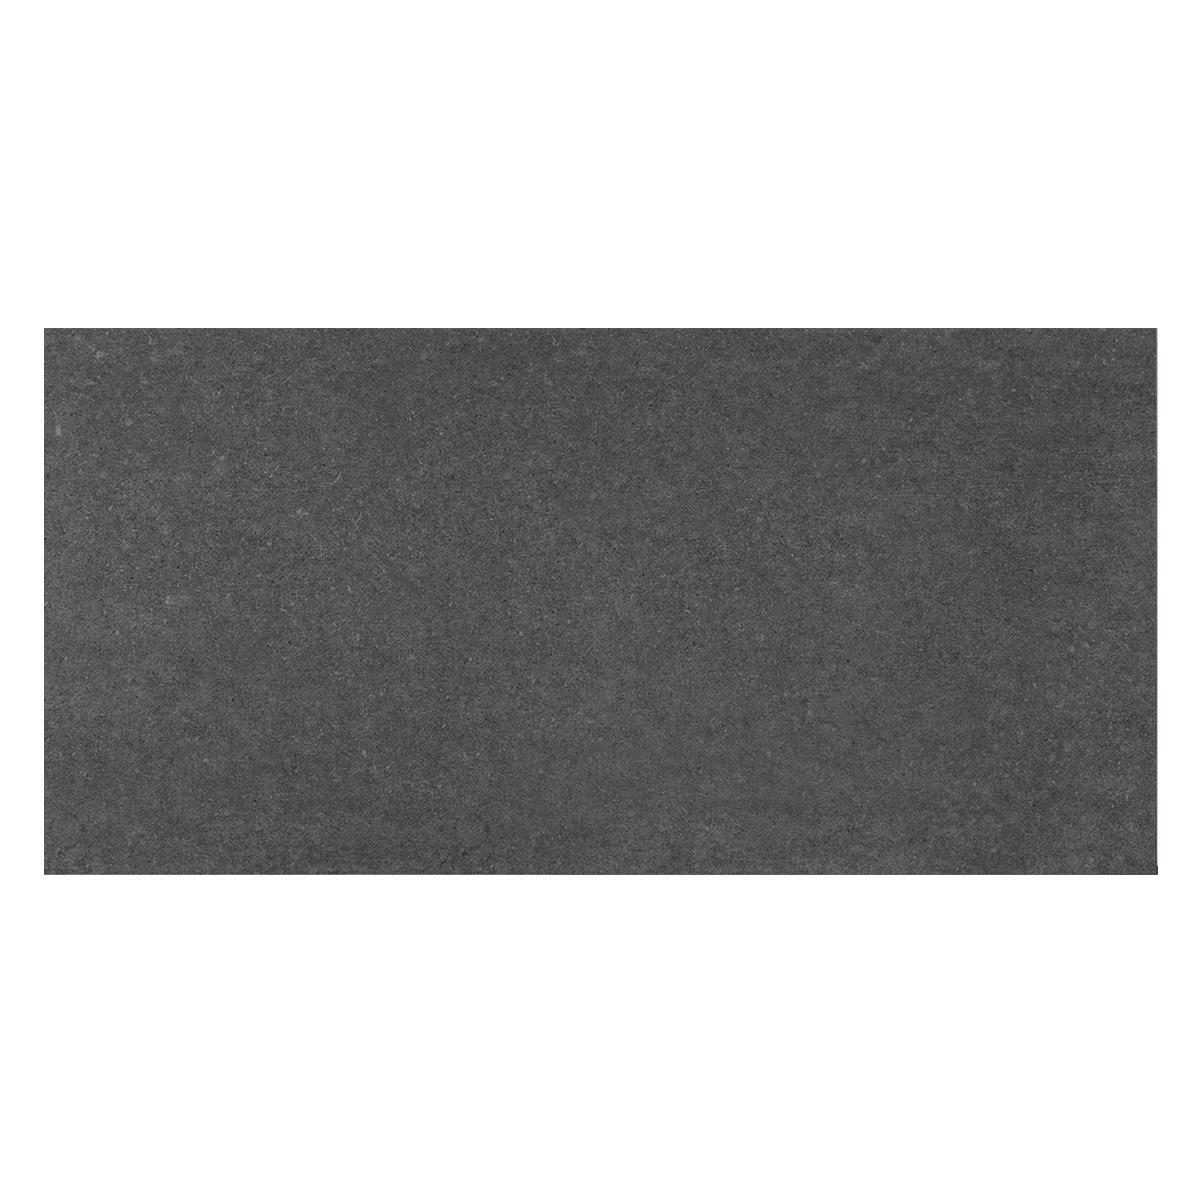 Porcelanato Sement Rectificado Negro Natural - 45X90 cm - 1.21 m2